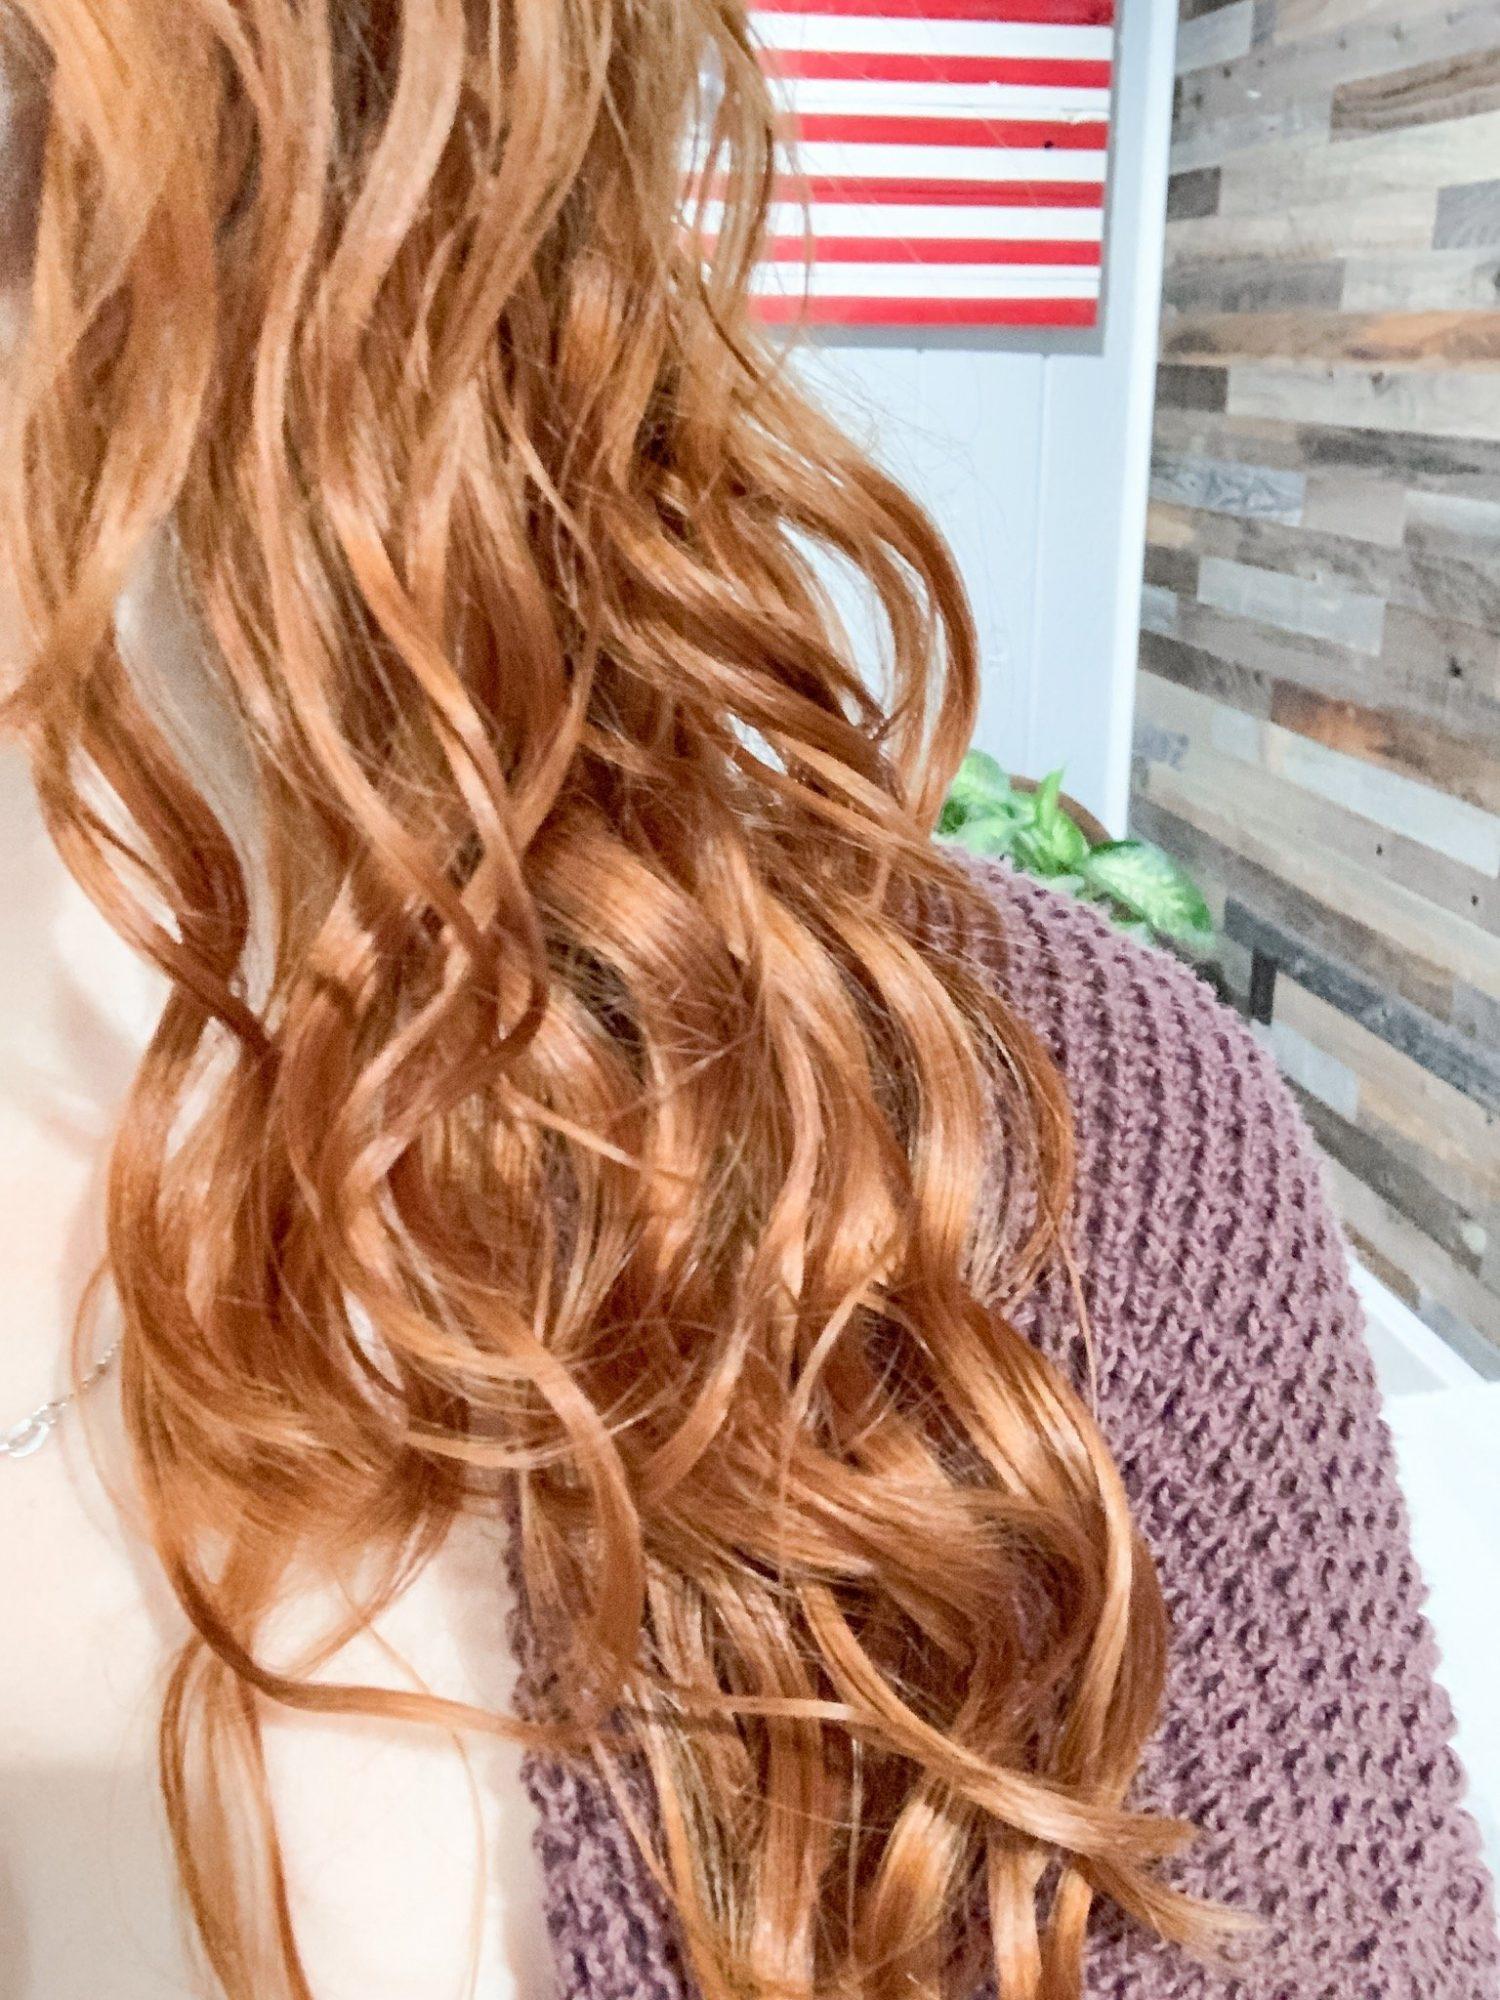 2b curly hair closeup